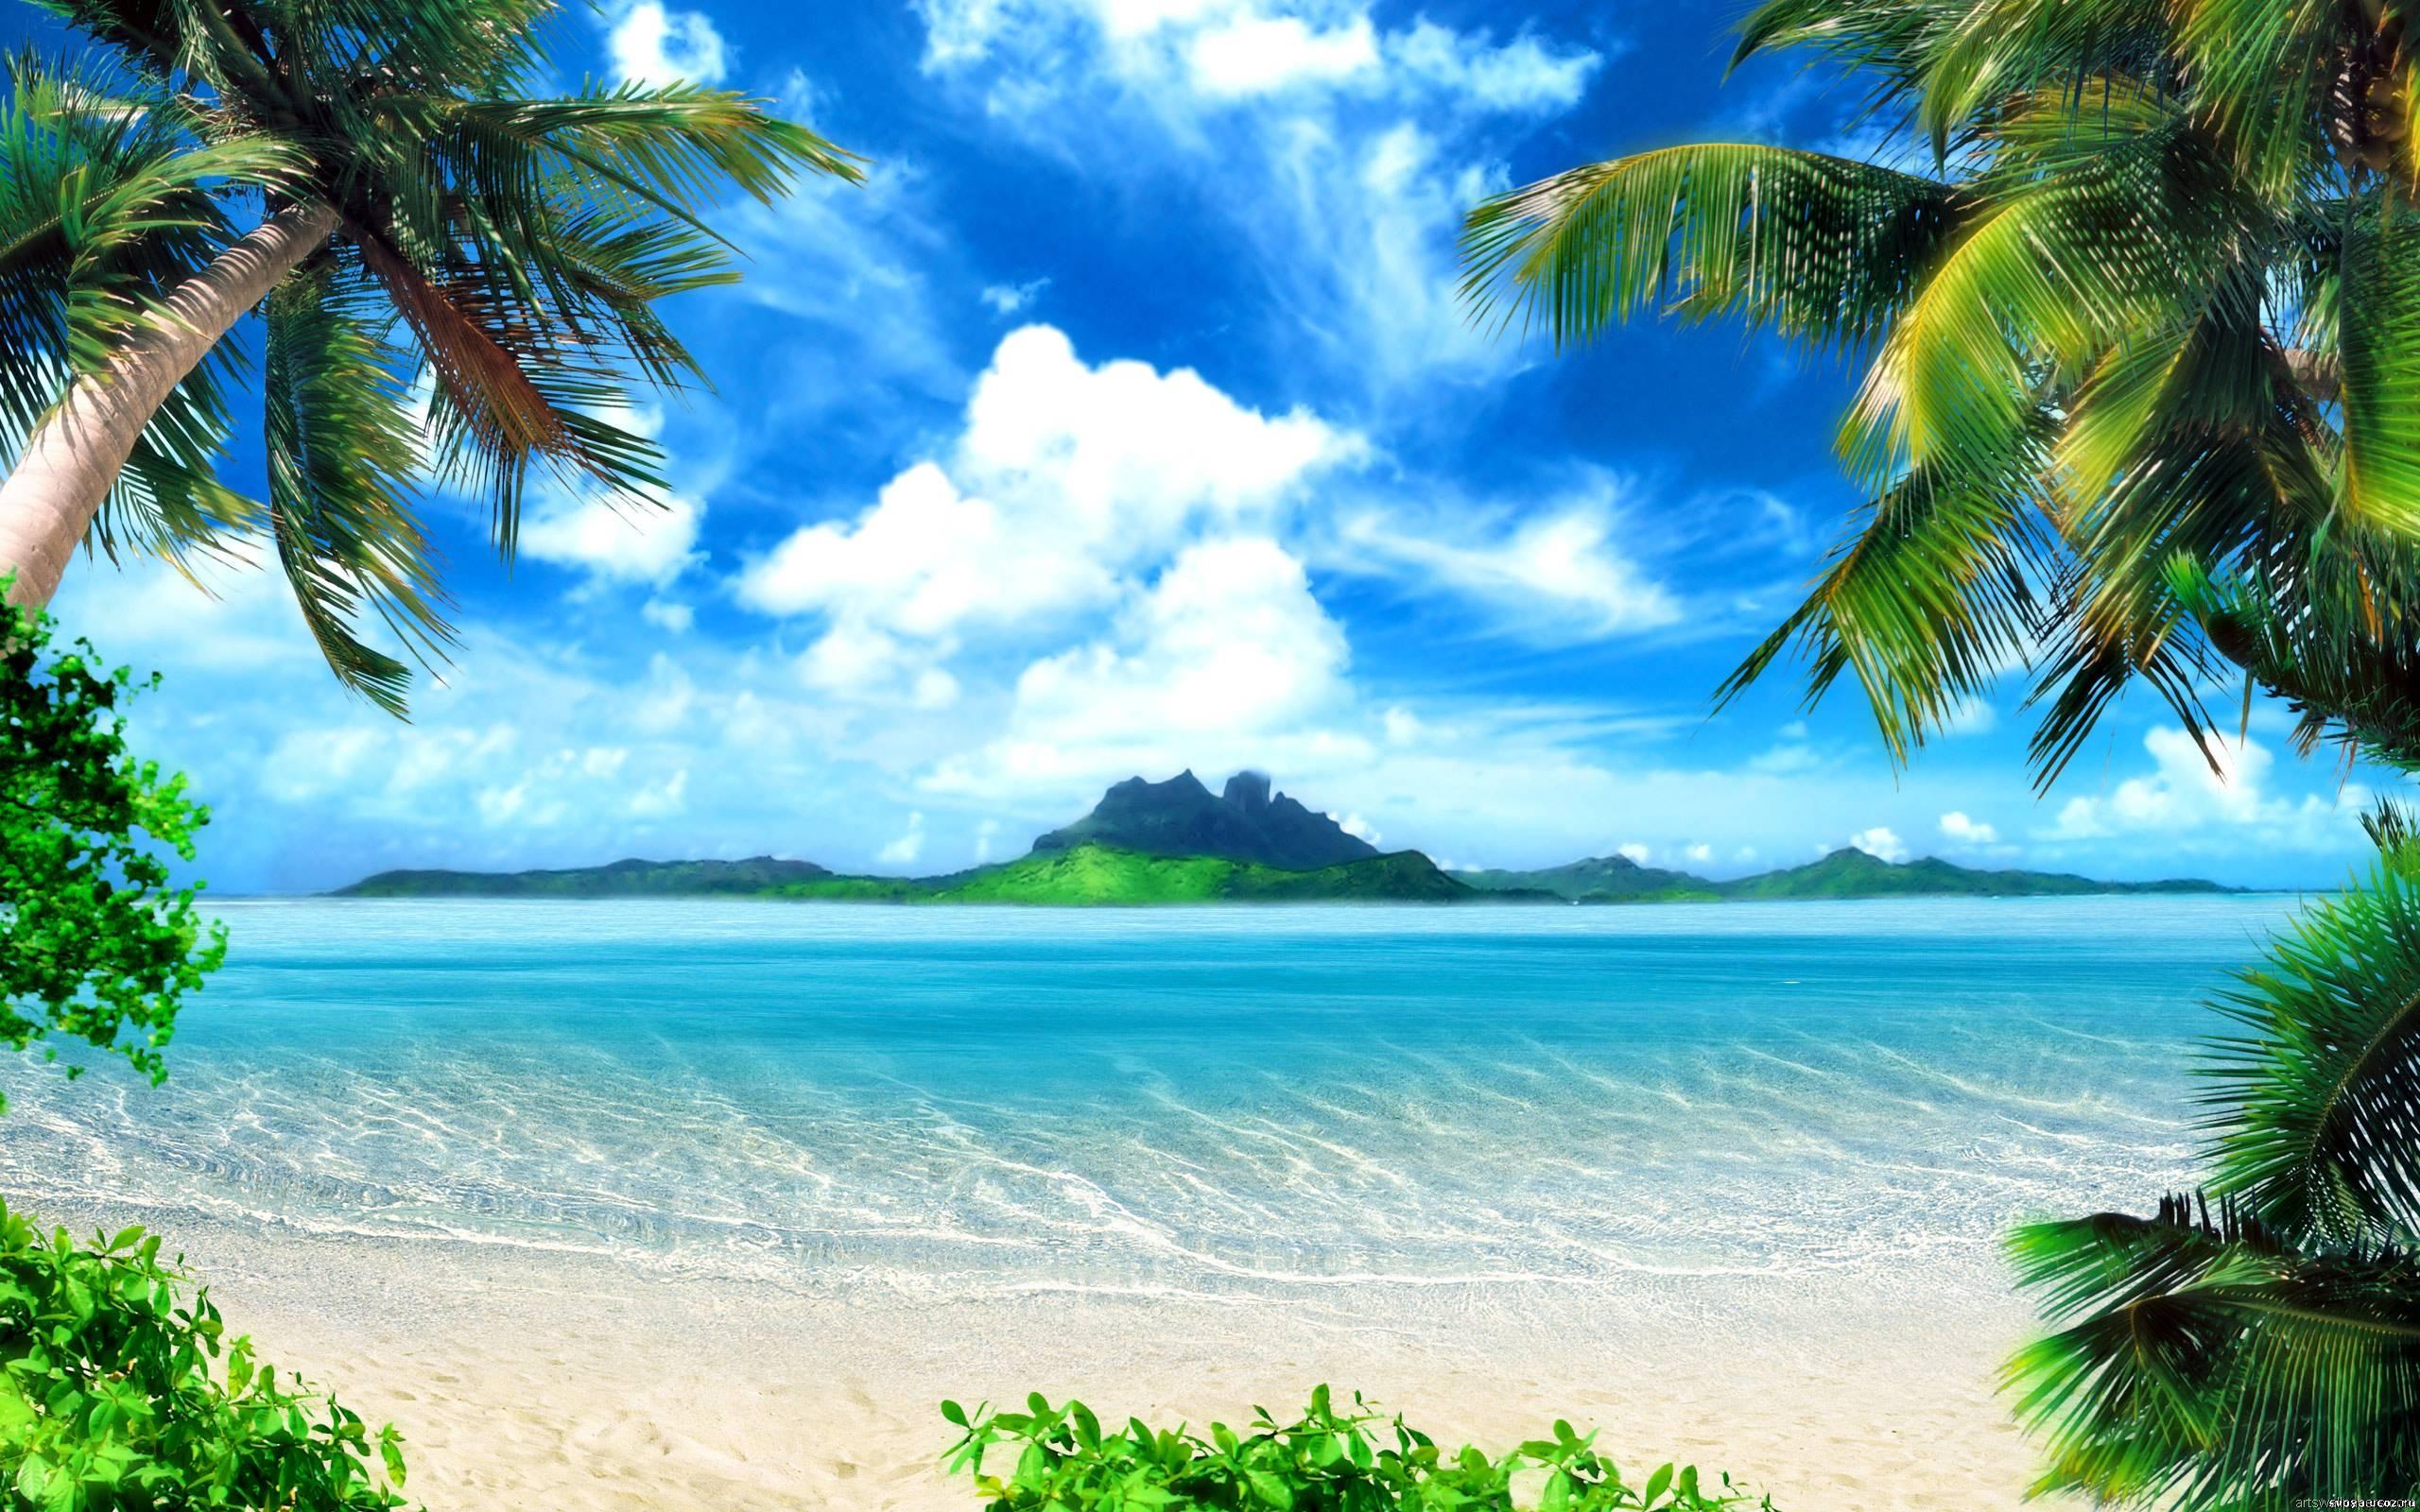 Hd Wallpapers 1080p Ocean: HD Ocean Wallpaper